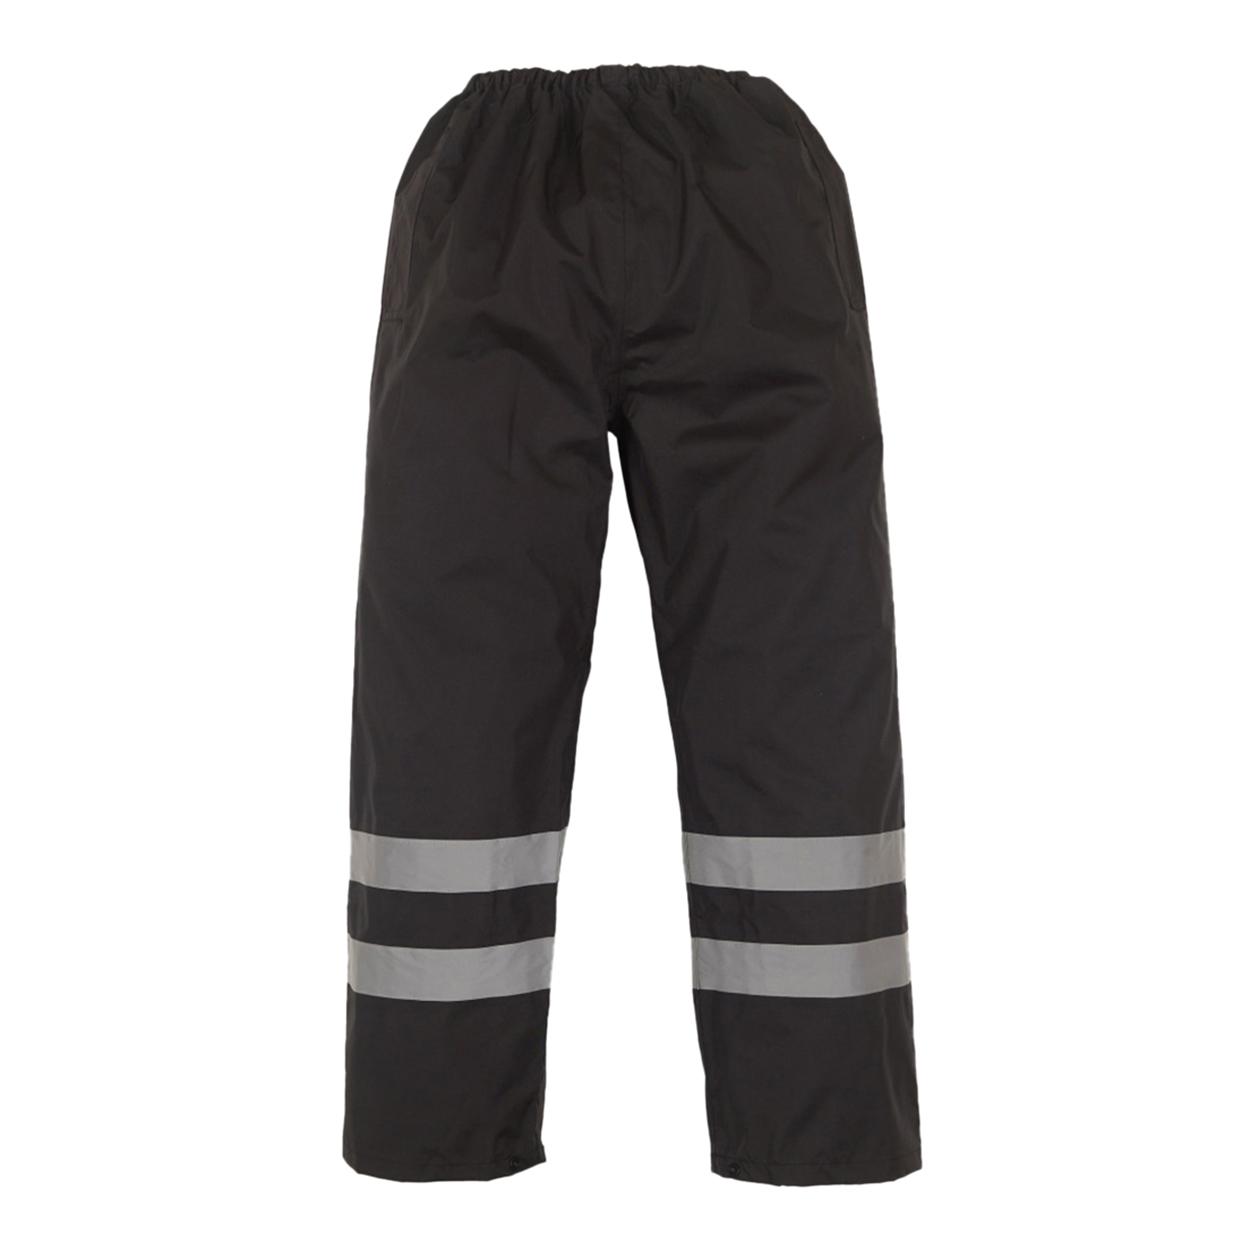 Yoko Mens Hi-Vis Waterproof Contractor Over Trousers (L) (Black)